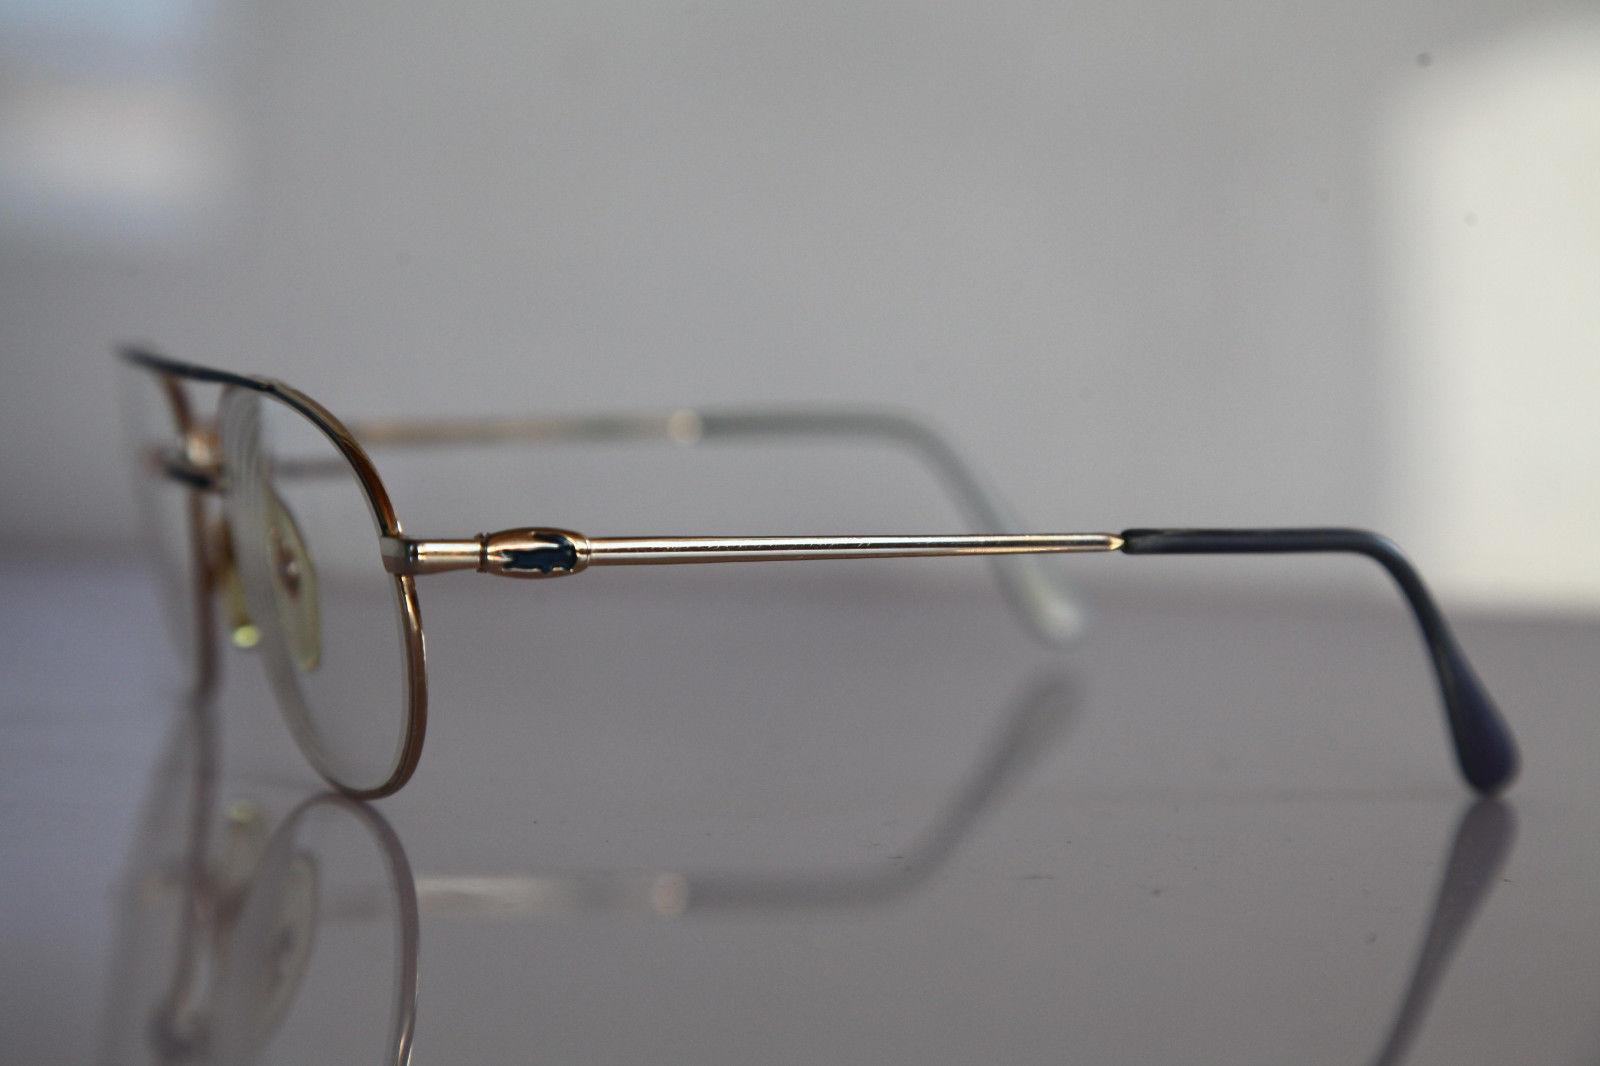 Vintage LACOSTE Eyewear, Gold Frame,  RX-Able Prescription lens.